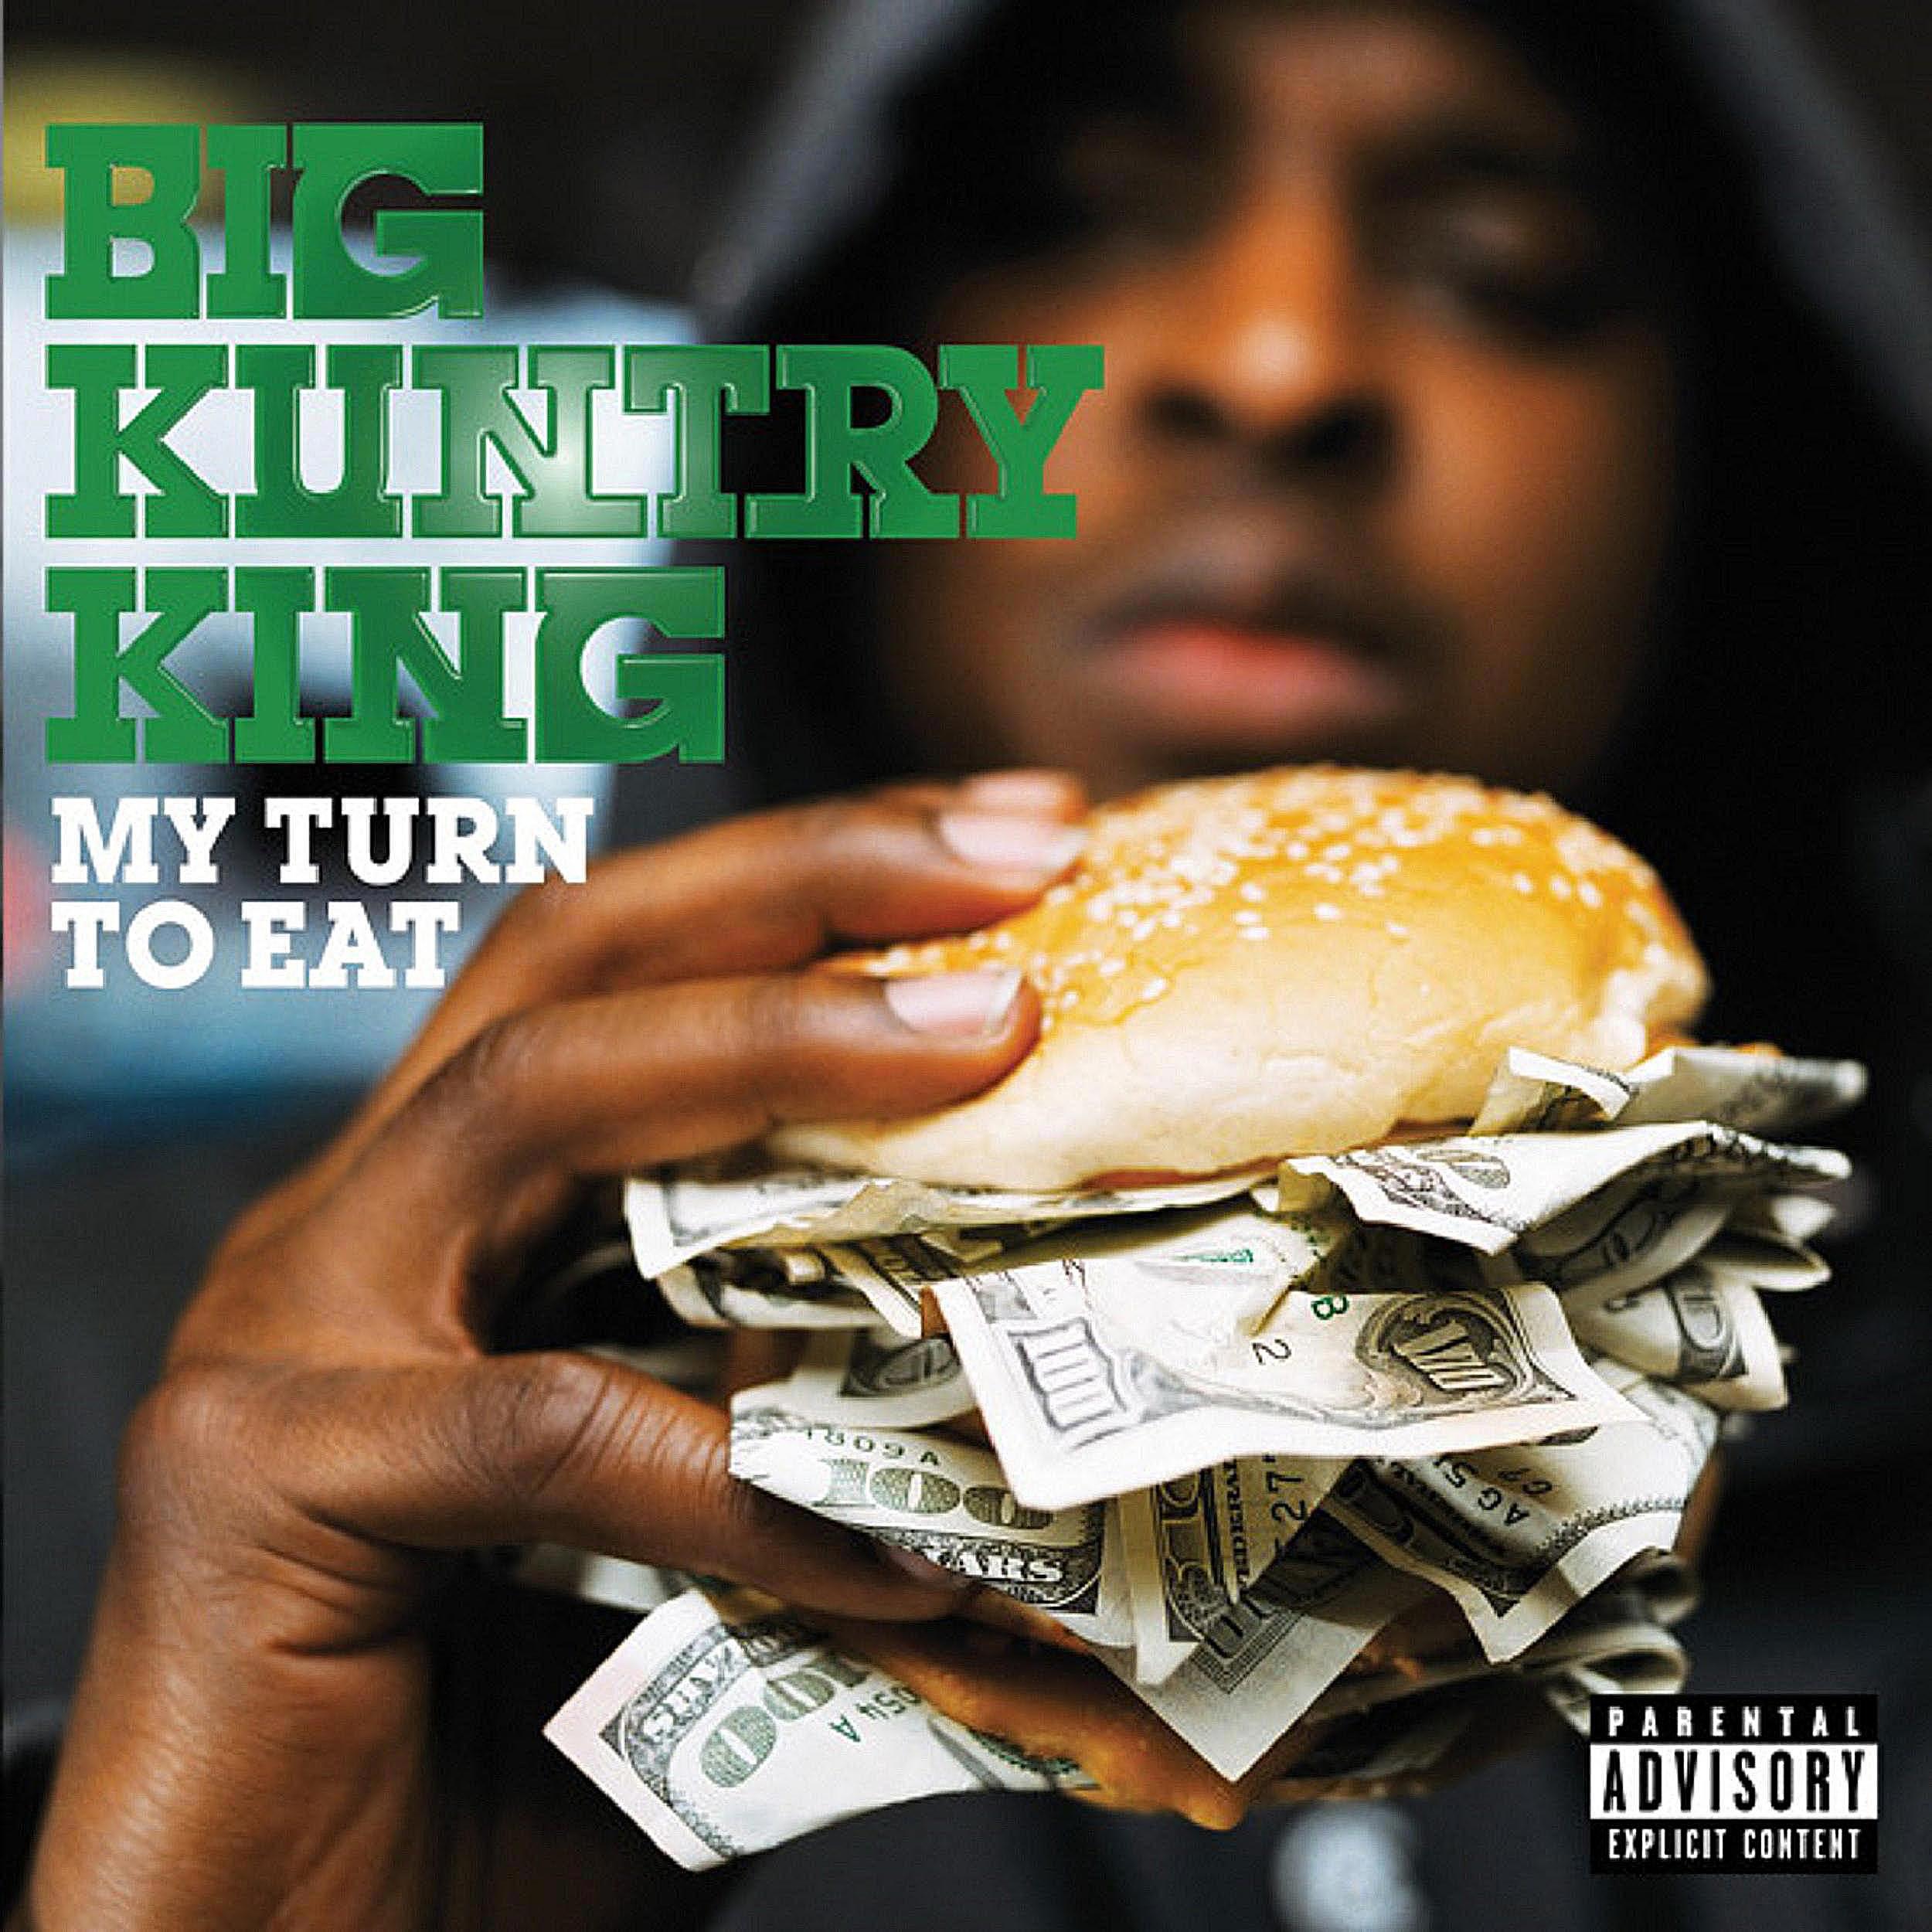 Big Kuntry King - My Turn to Eat